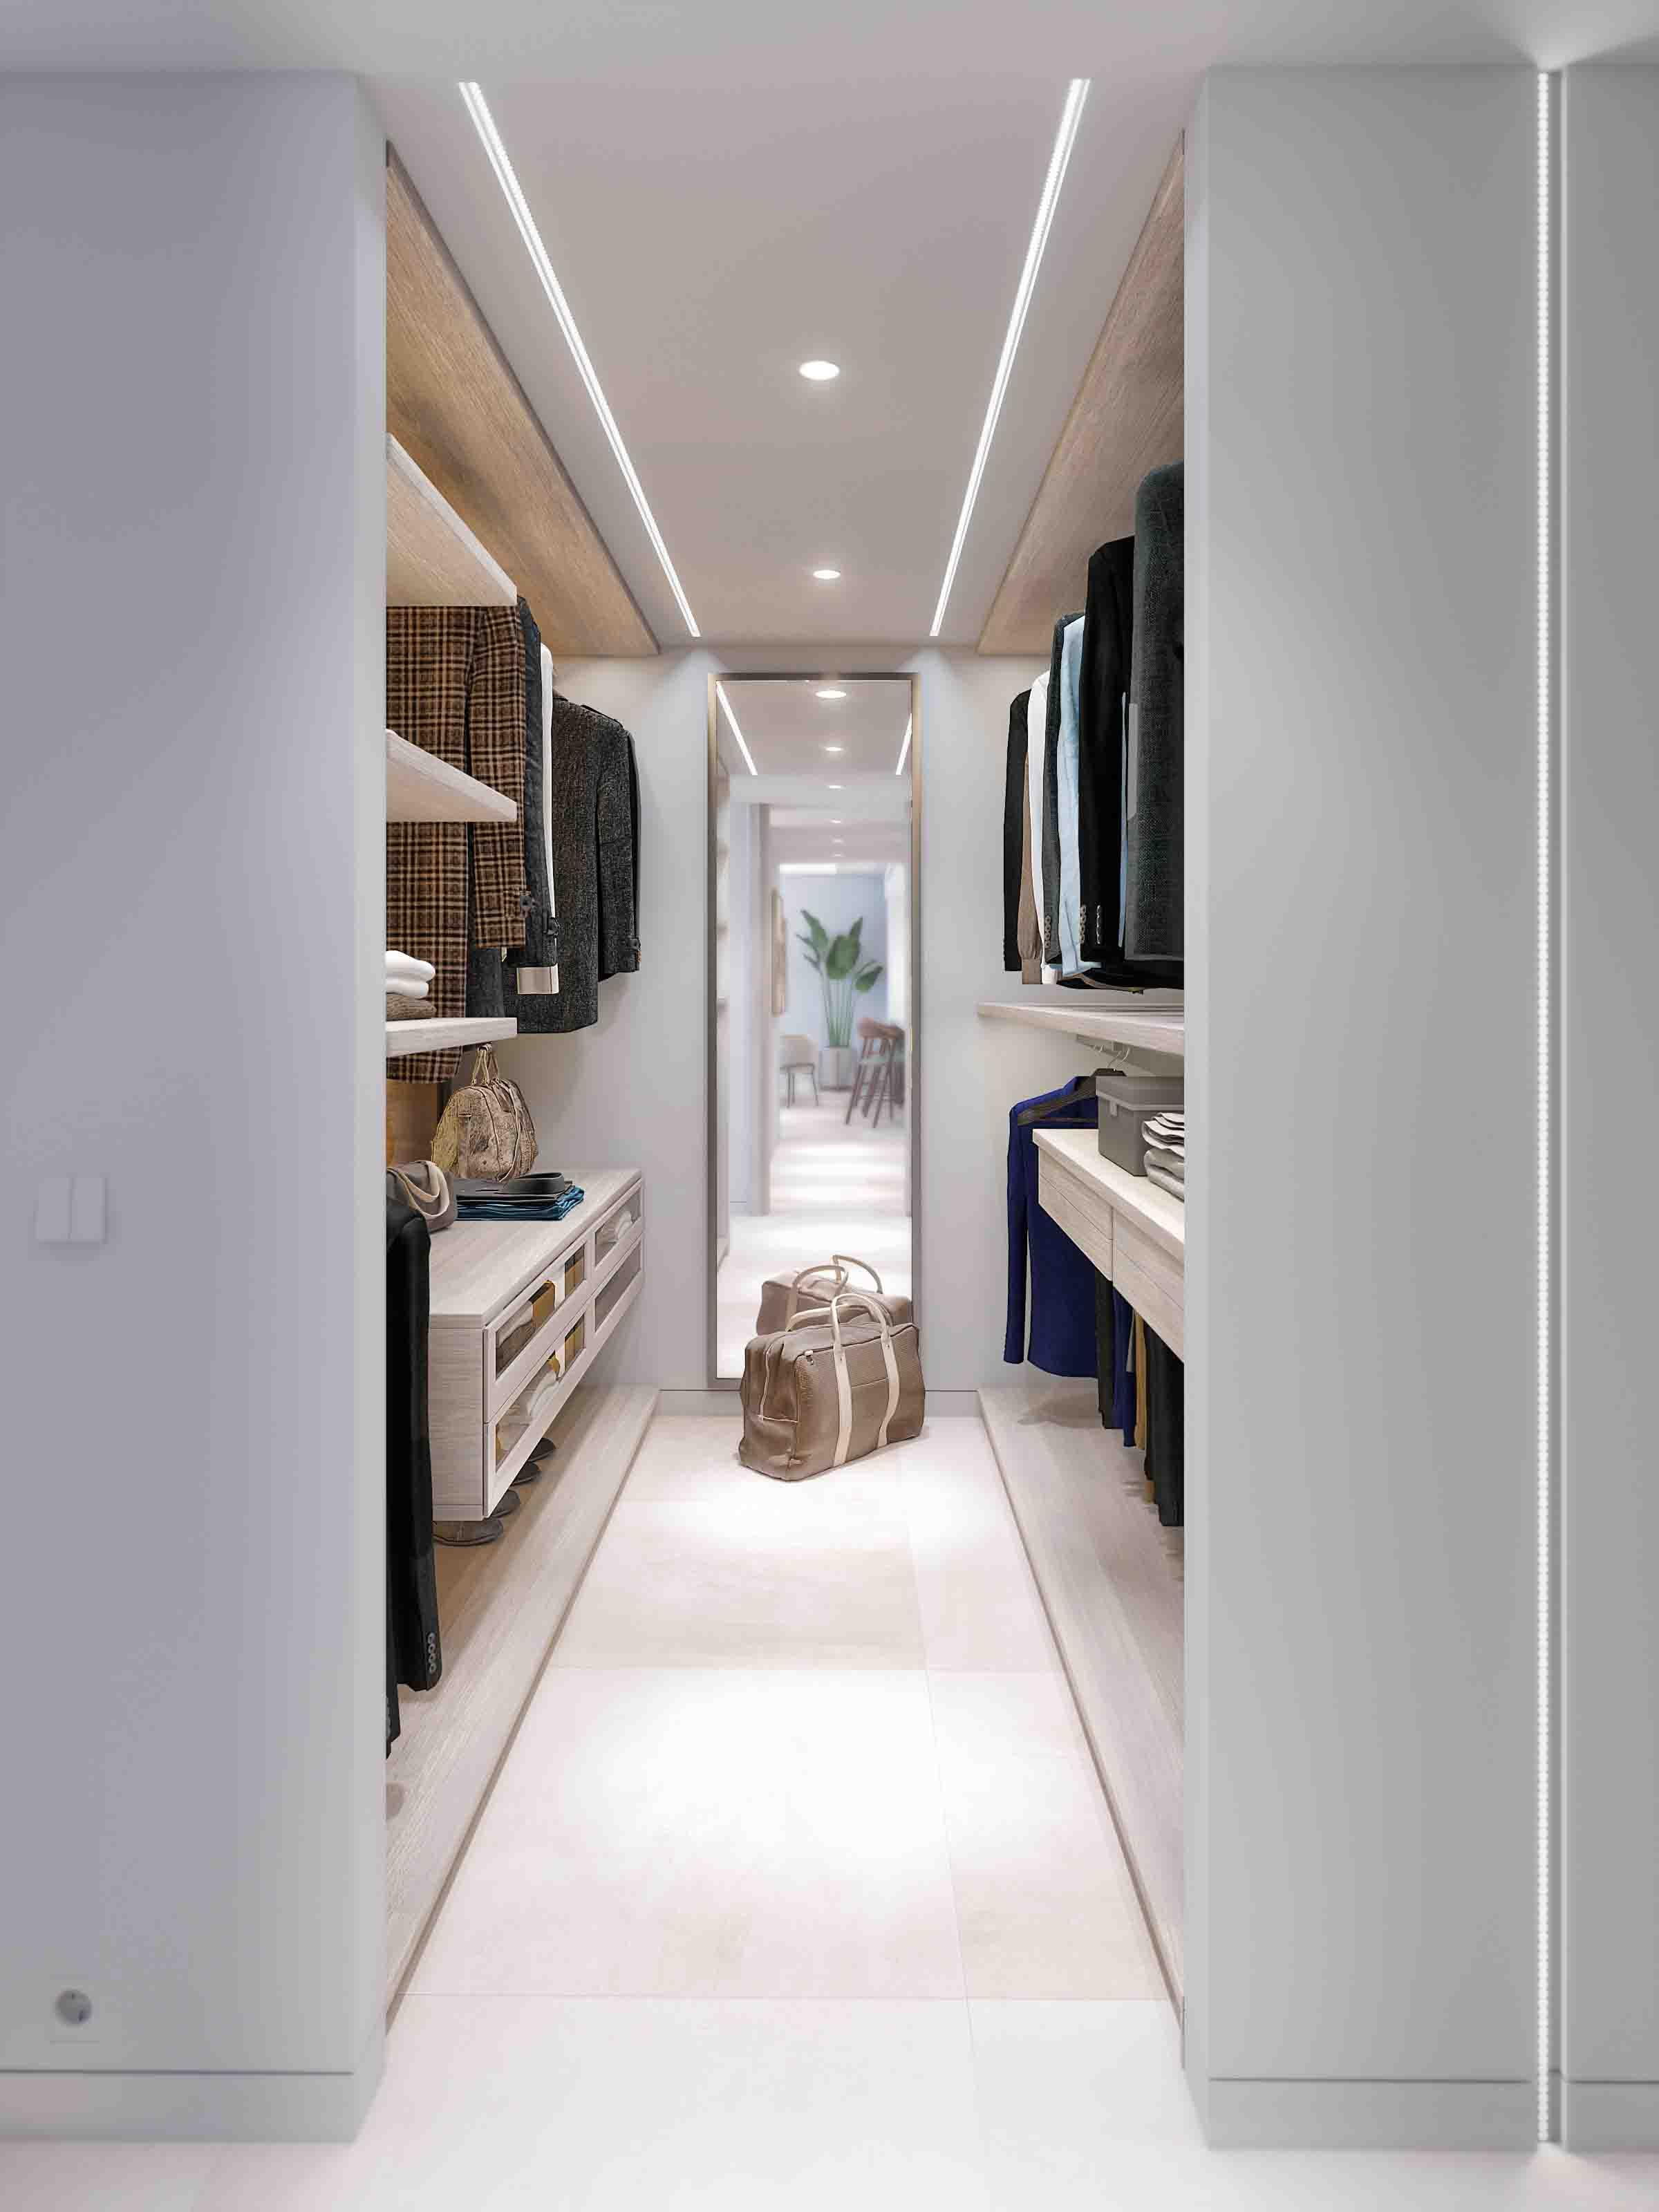 2, 2 Bedrooms Bedrooms, ,2 BathroomsBathrooms,Apartment,For Sale,1129